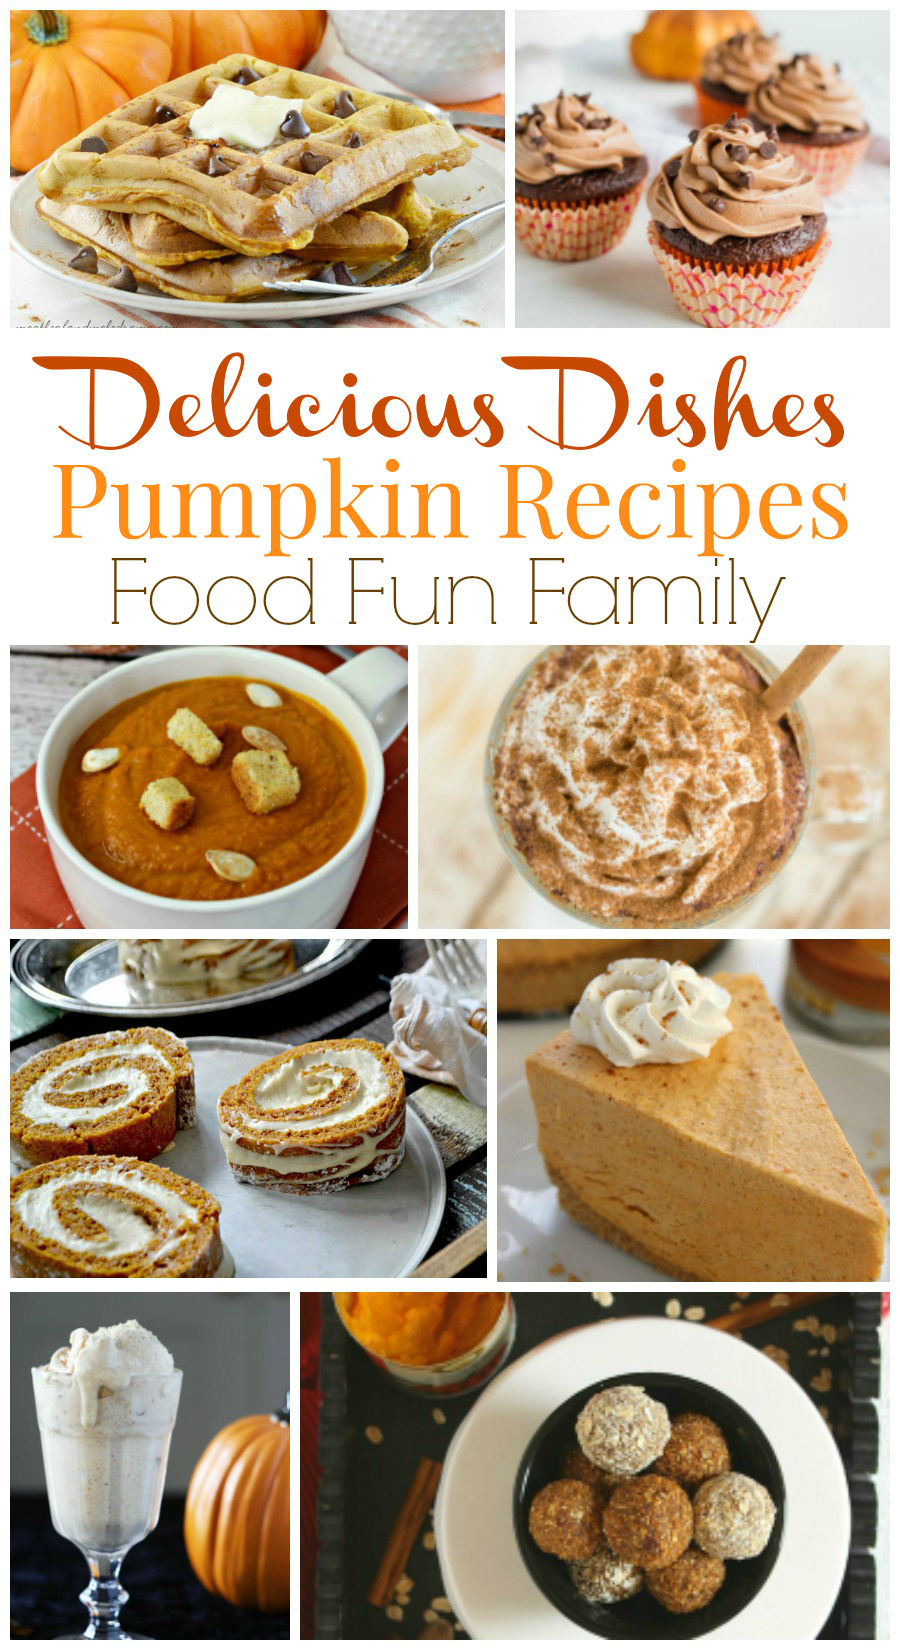 Delicious Dishes Recipe Party - host favorite pumpkin recipes